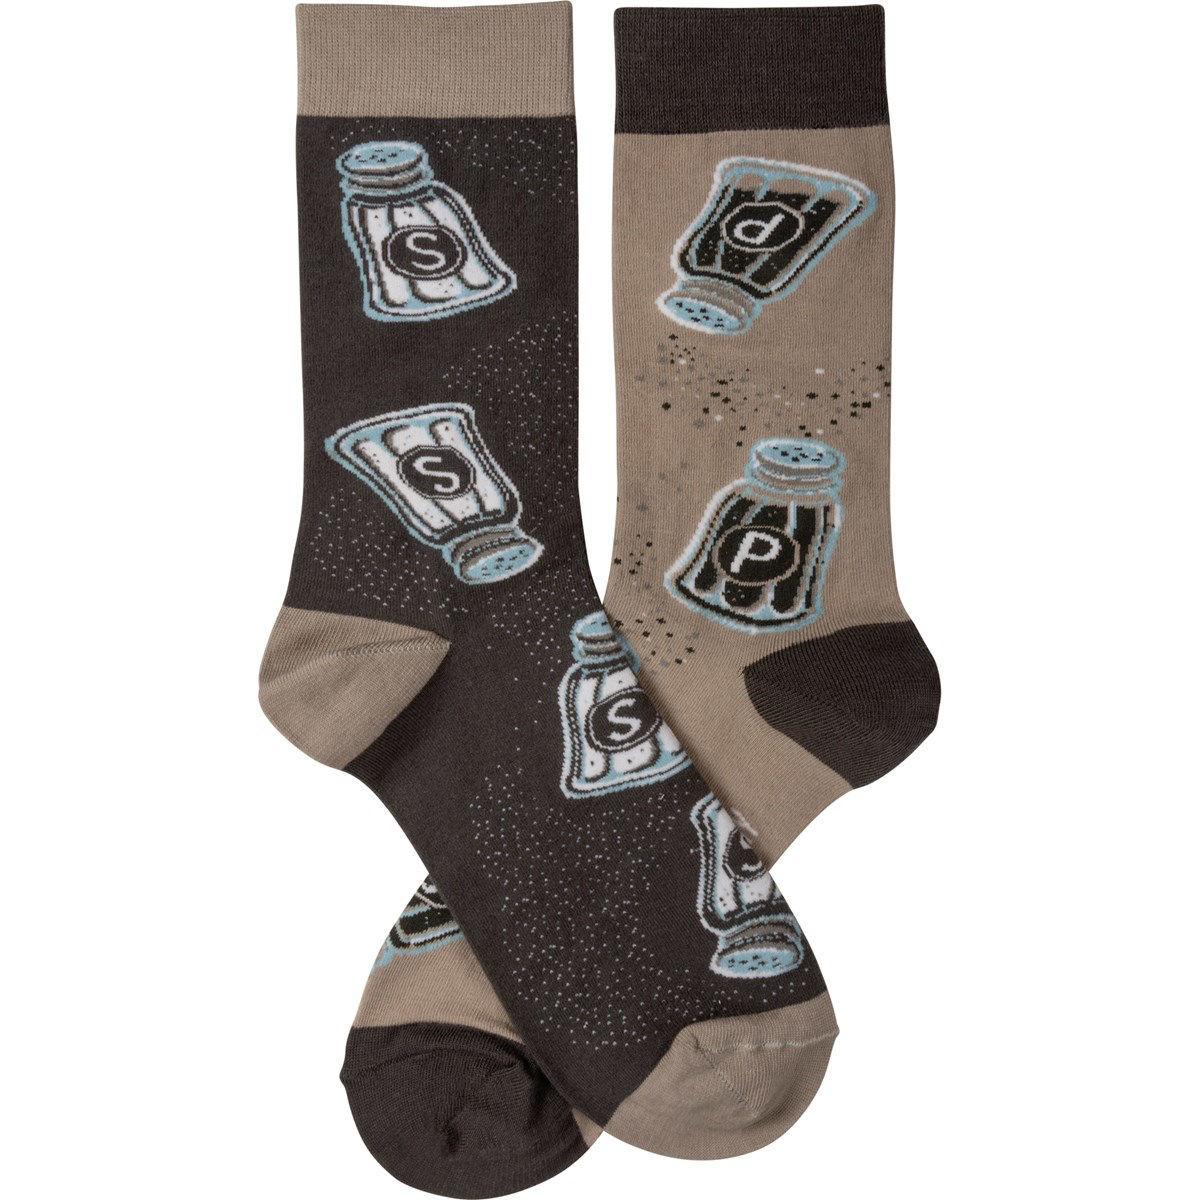 Salt & Pepper Socks by Primitives by Kathy